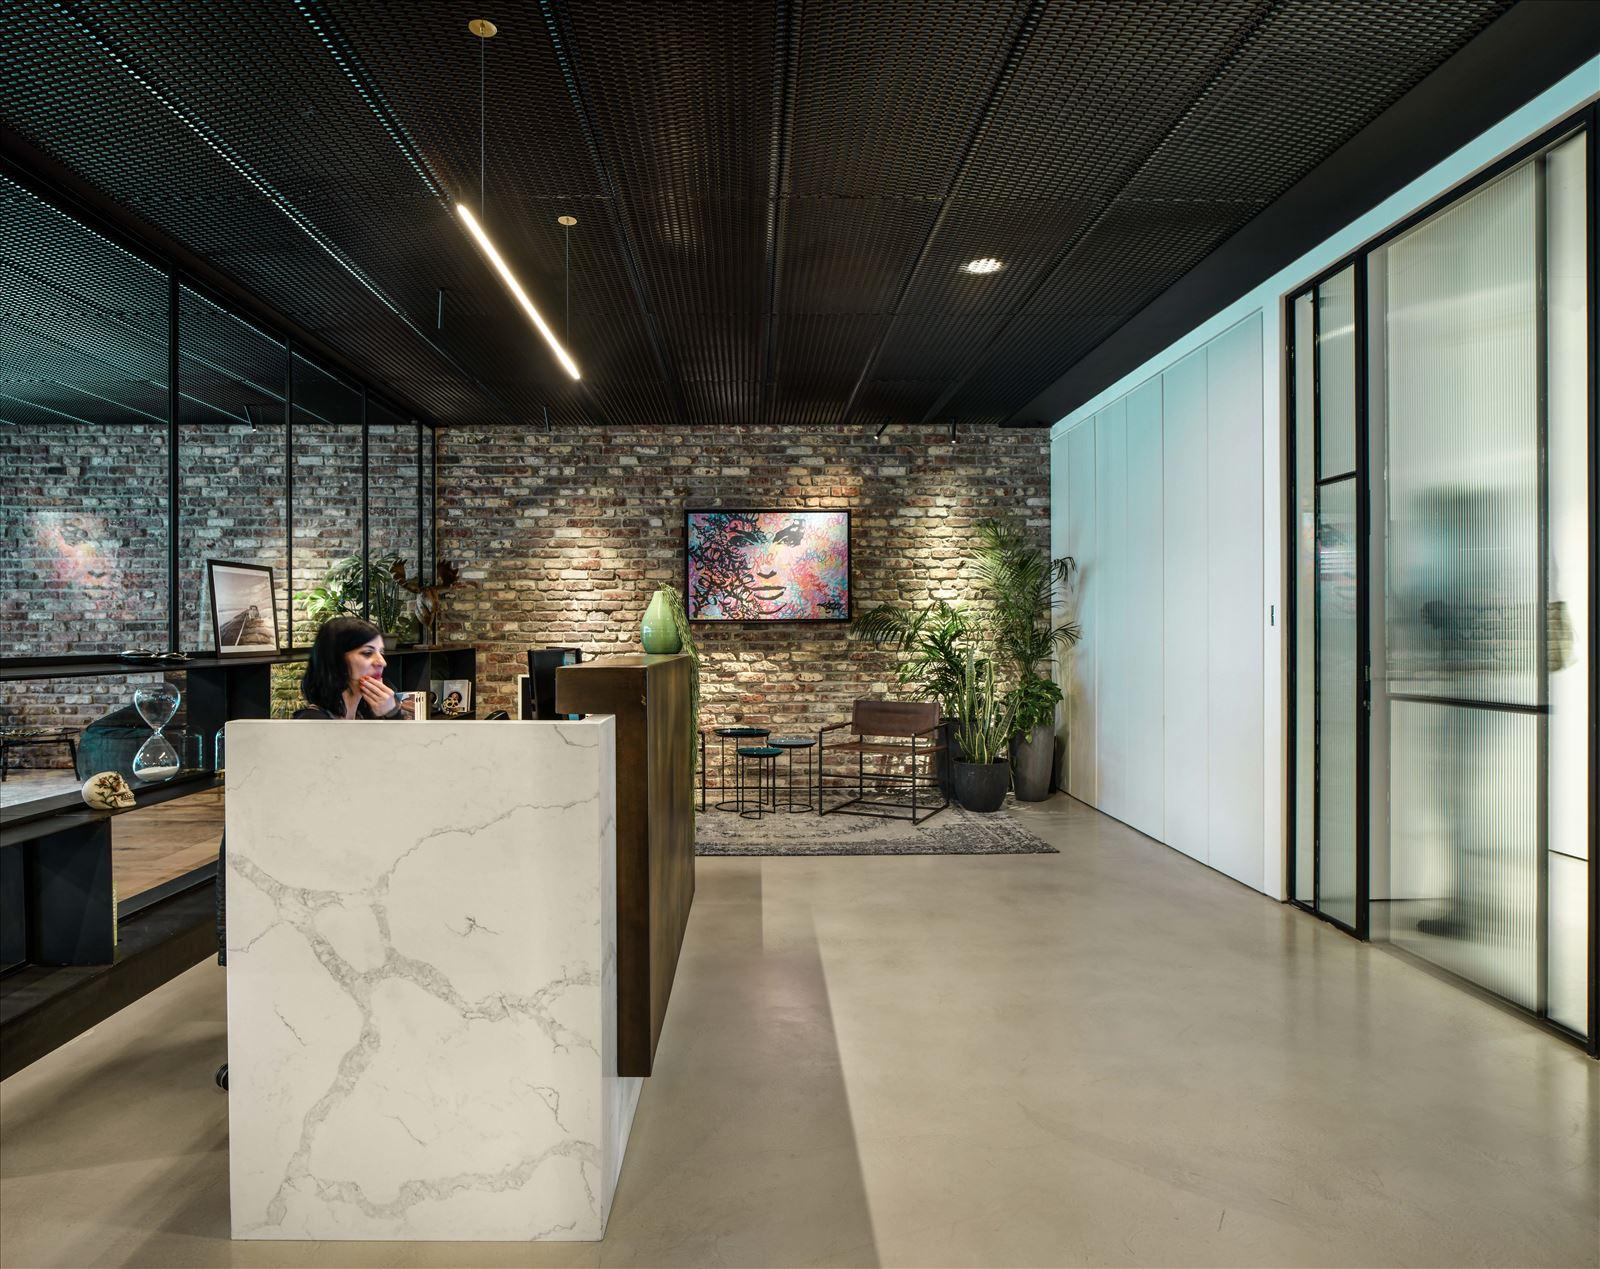 Arbitrage office גוף תאורה מעל דלפק המשרד נעשה על ידי דורי קמחי